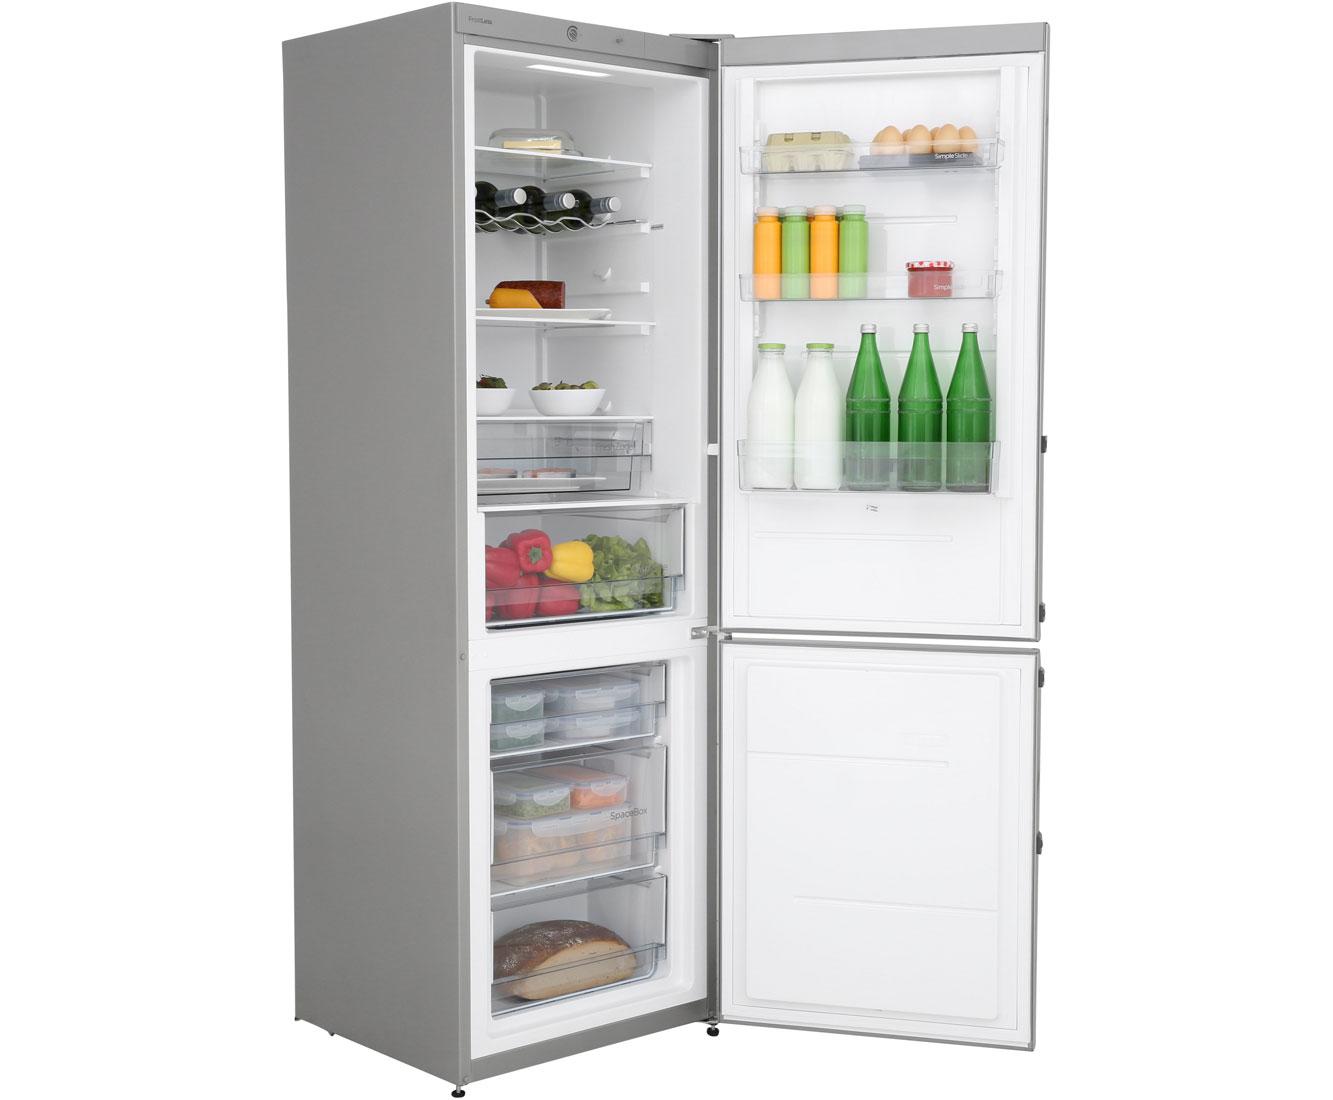 Bomann Kühlschrank Lampe Wechseln : Gorenje kühlschrank birne wechseln gorenje kühlschrank birne